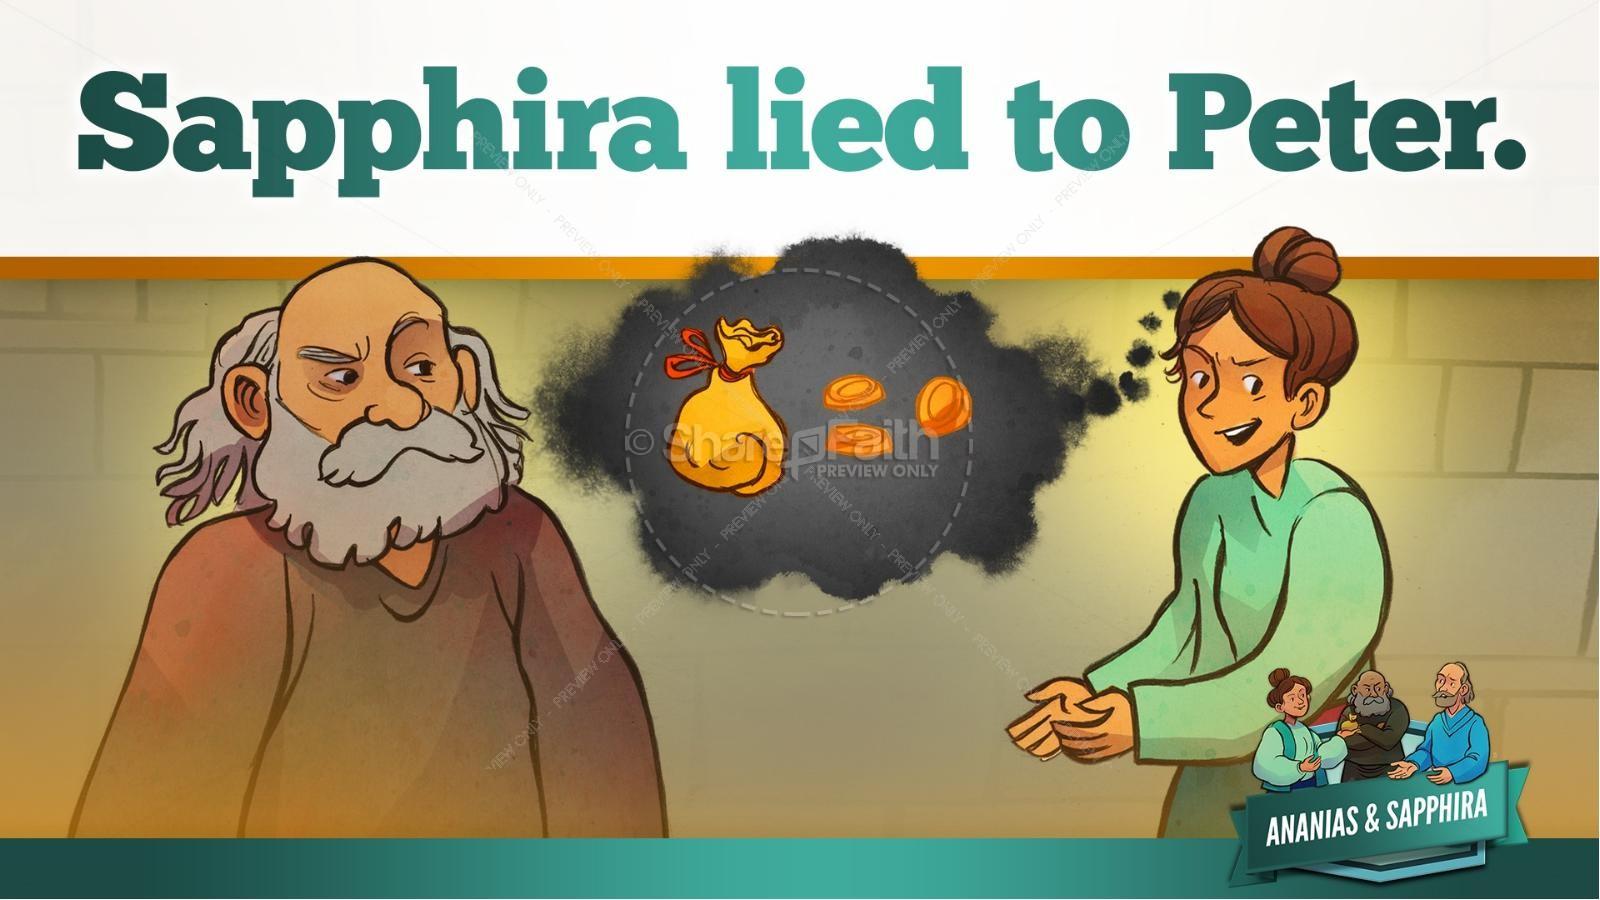 Acts 5 Ananias and Sapphira Kids Bible Stories | slide 34